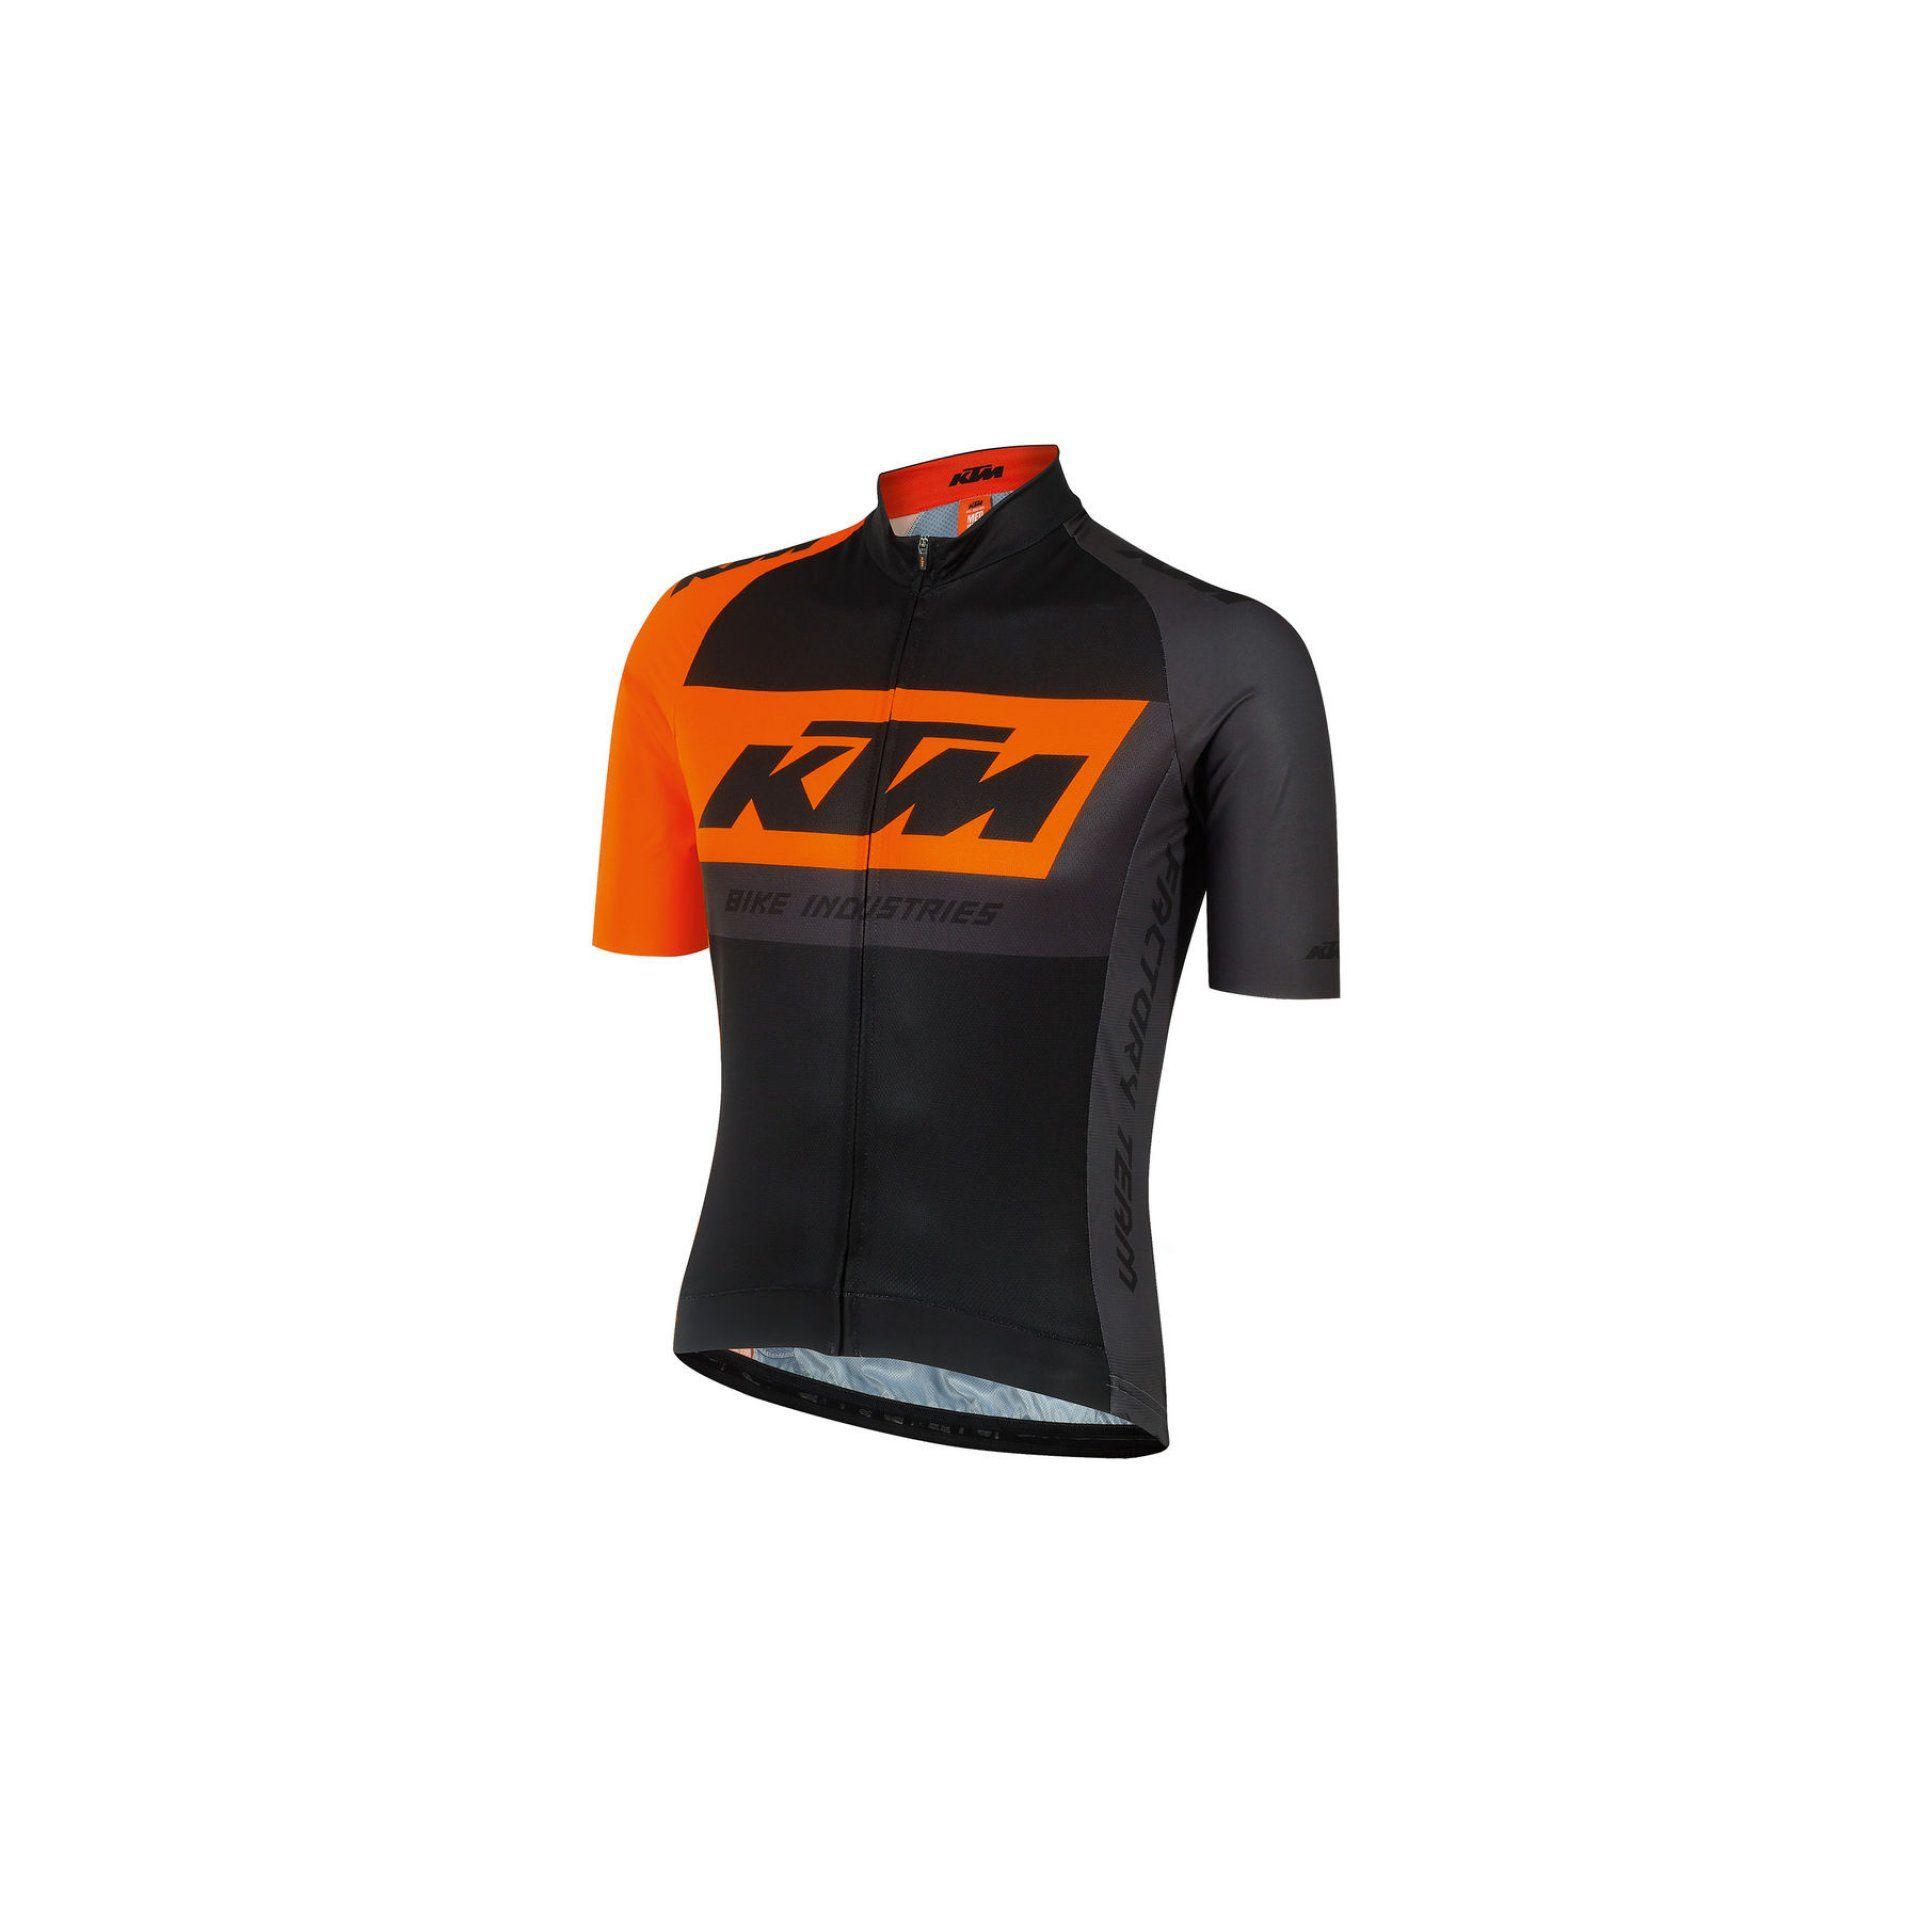 KOSZULKA ROWEROWA KTM FACTORY TEAM BLACK 659276056 1